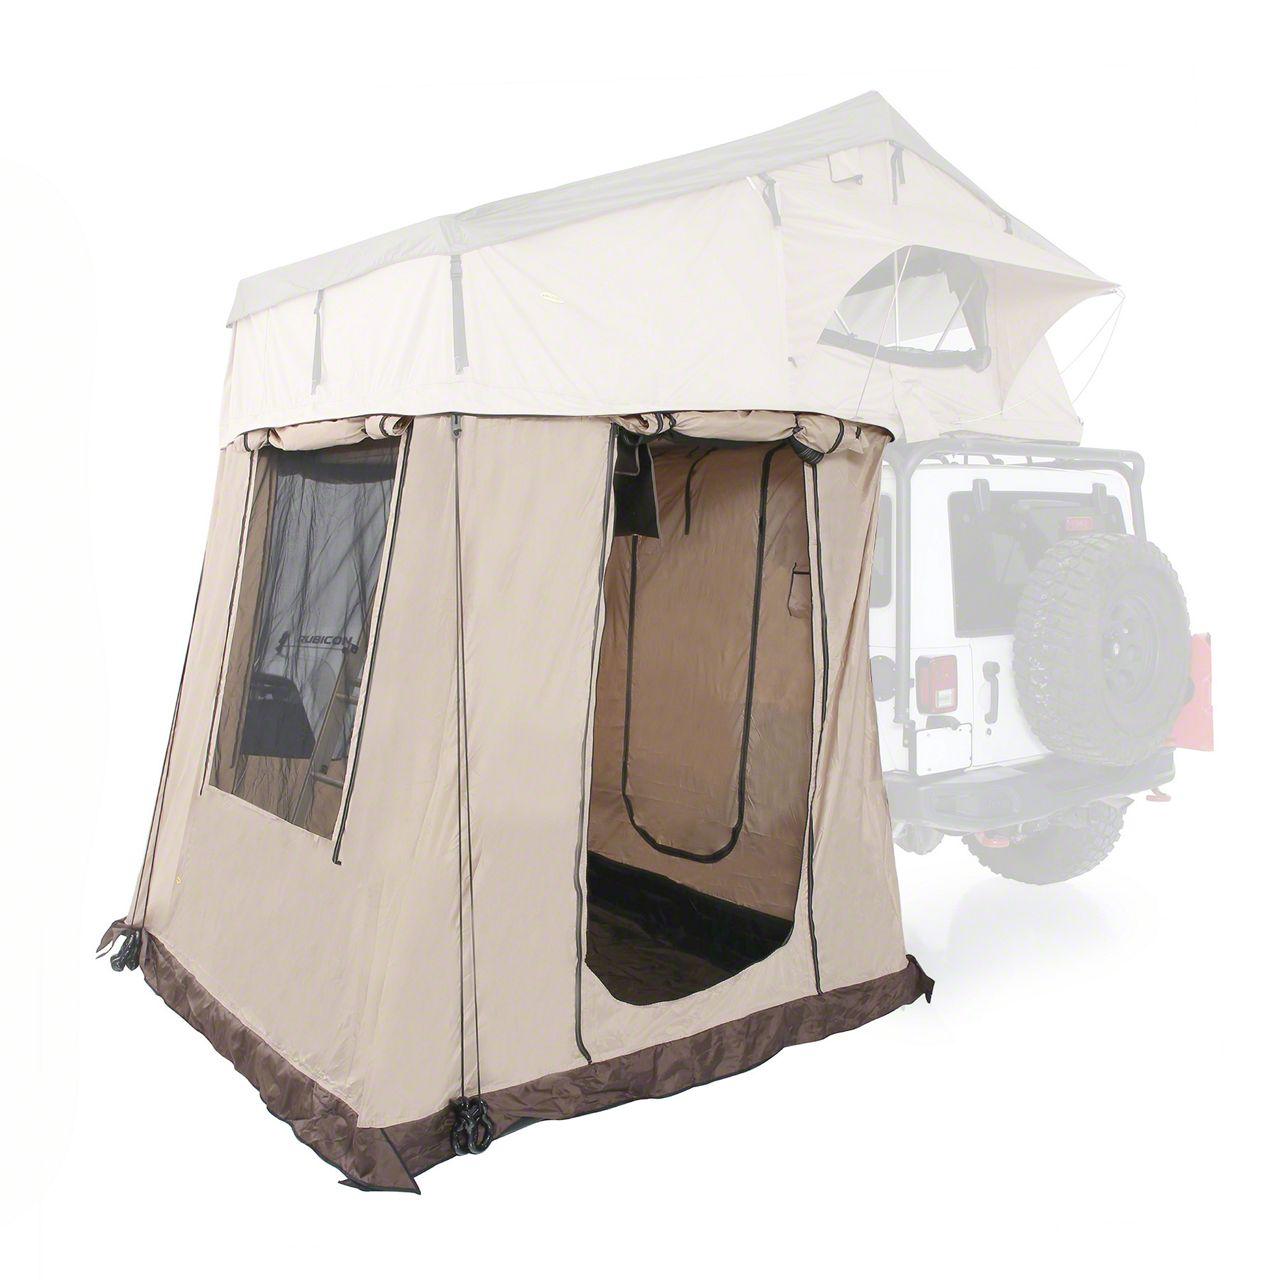 Smittybilt Tent Annex XL for Overlander Roof Top Tent